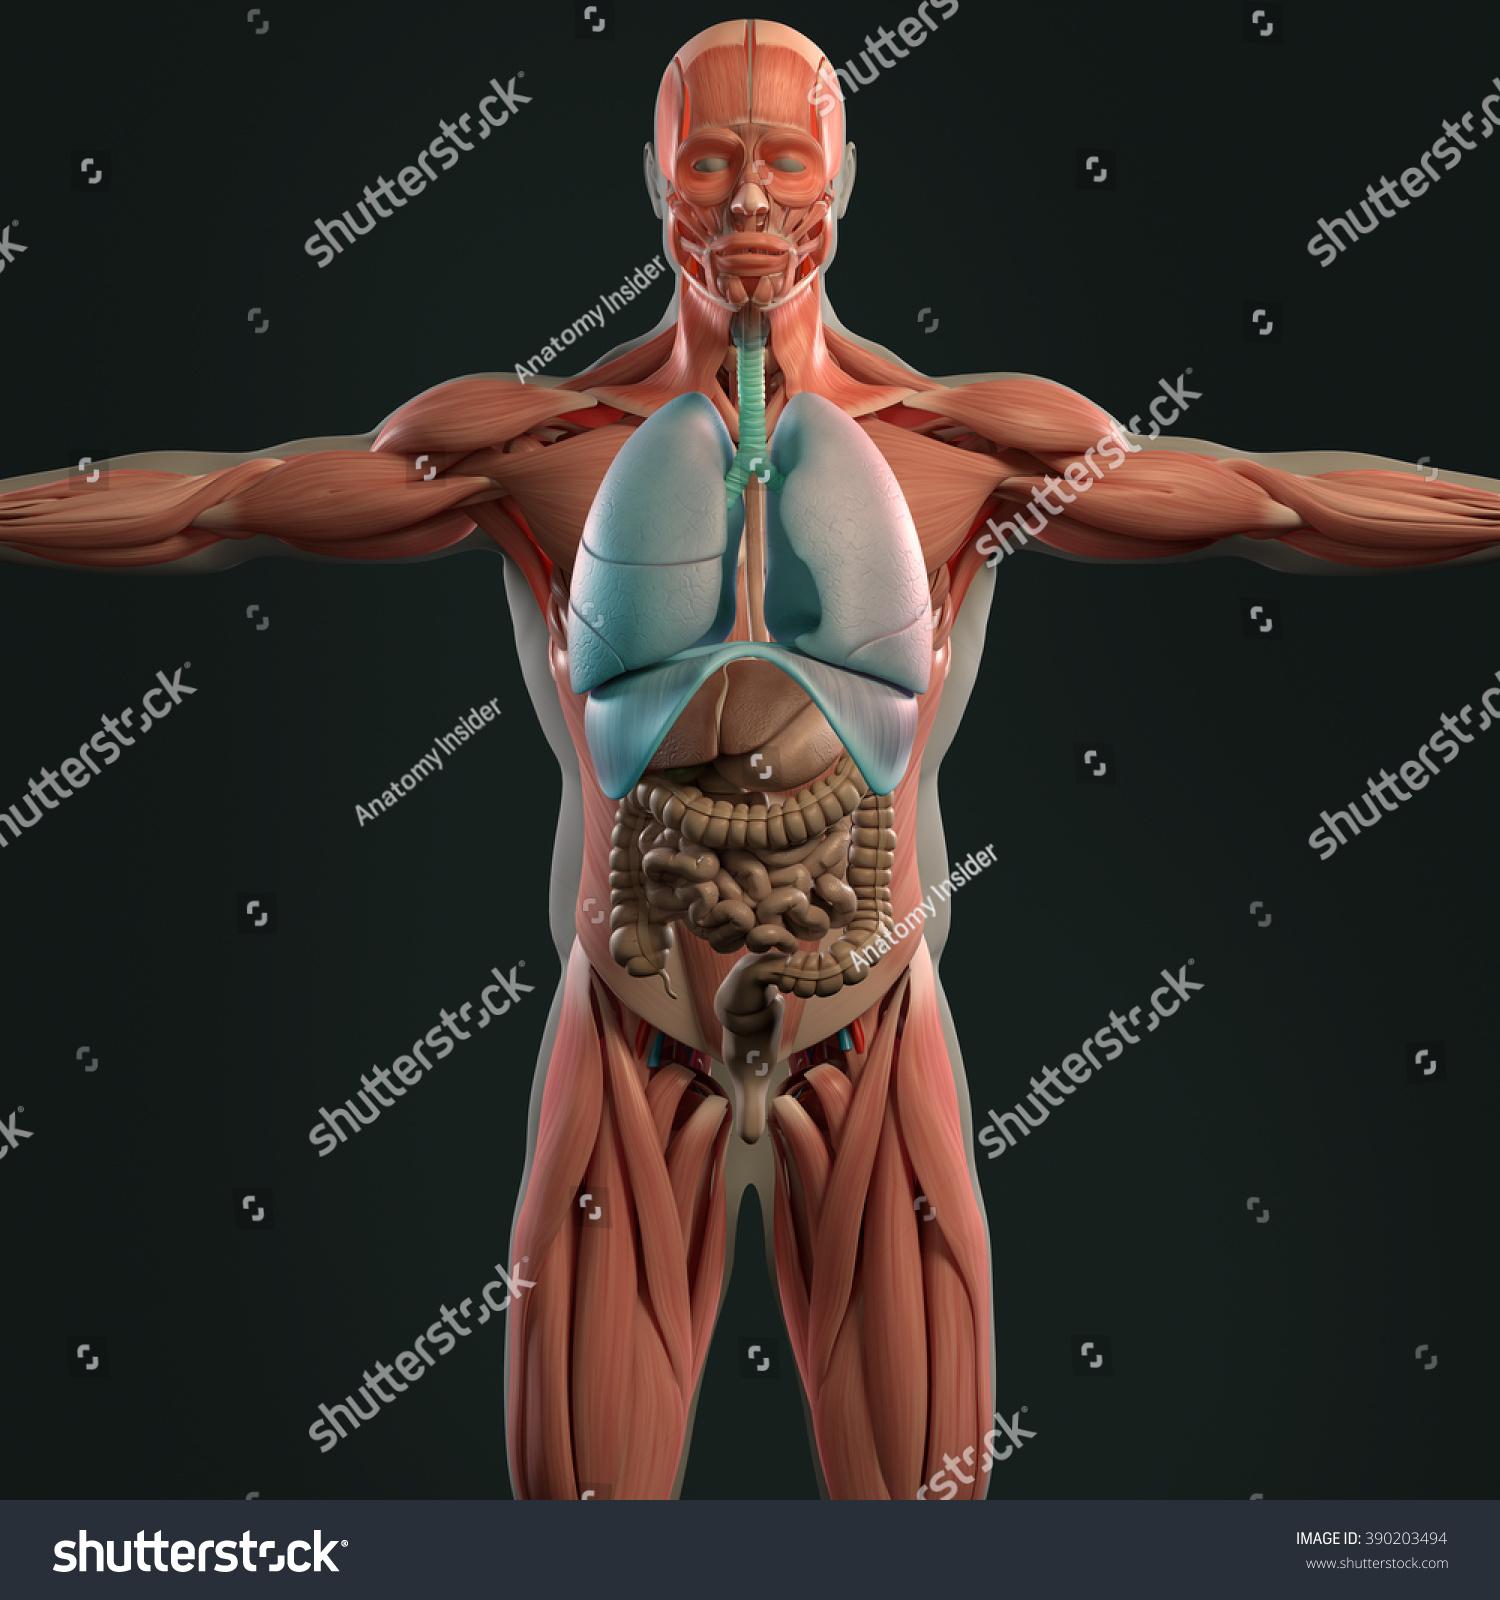 Human Anatomy 3 D Futuristic Scan Technology Stock Illustration